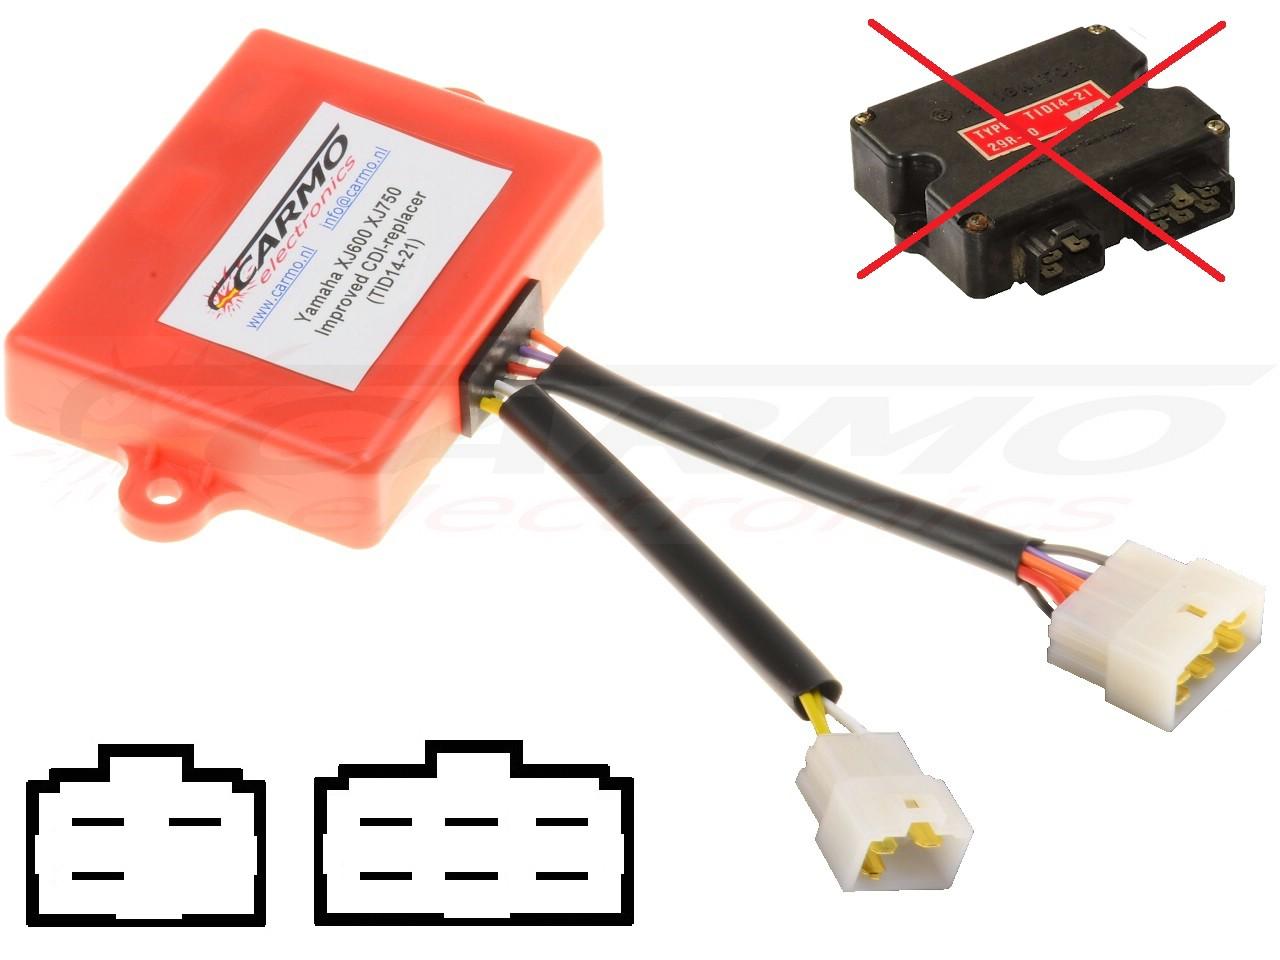 hight resolution of tci wiring diagram yamaha 750 maxim wiring diagram for you yamaha 90 wiring diagram tci wiring diagram yamaha 750 maxim